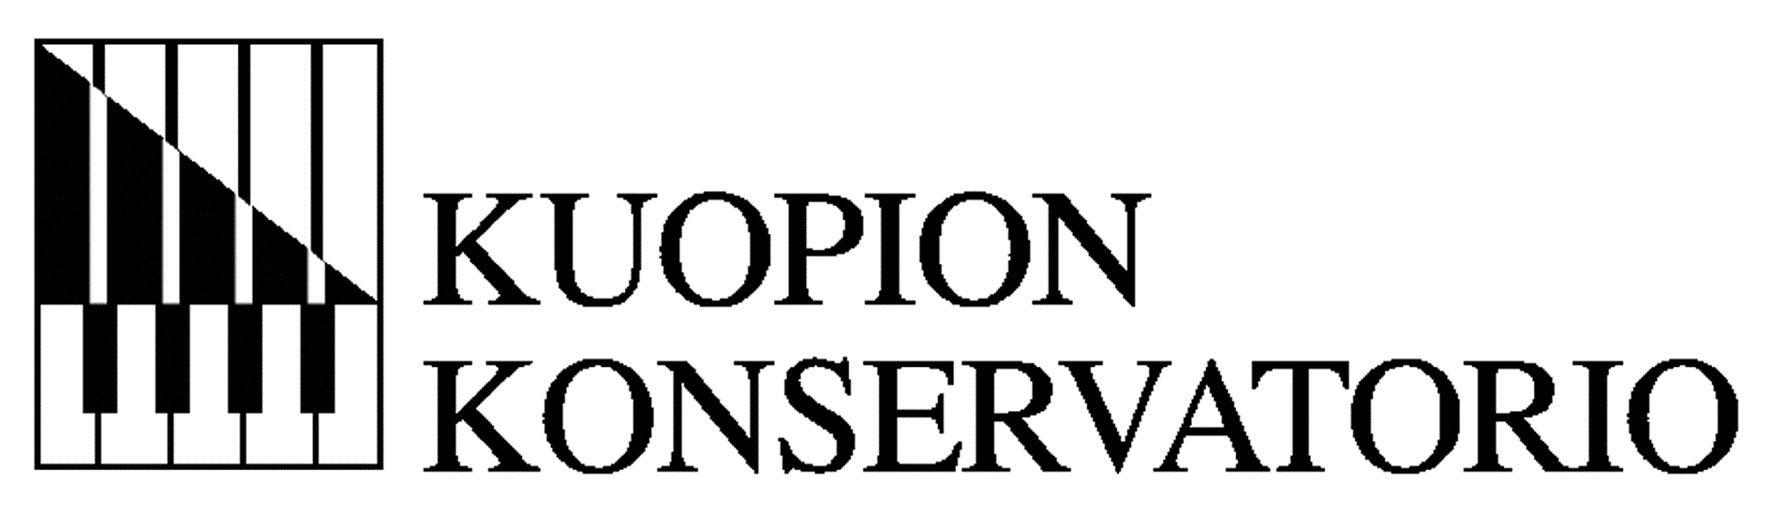 Kuopion konservatorion logo